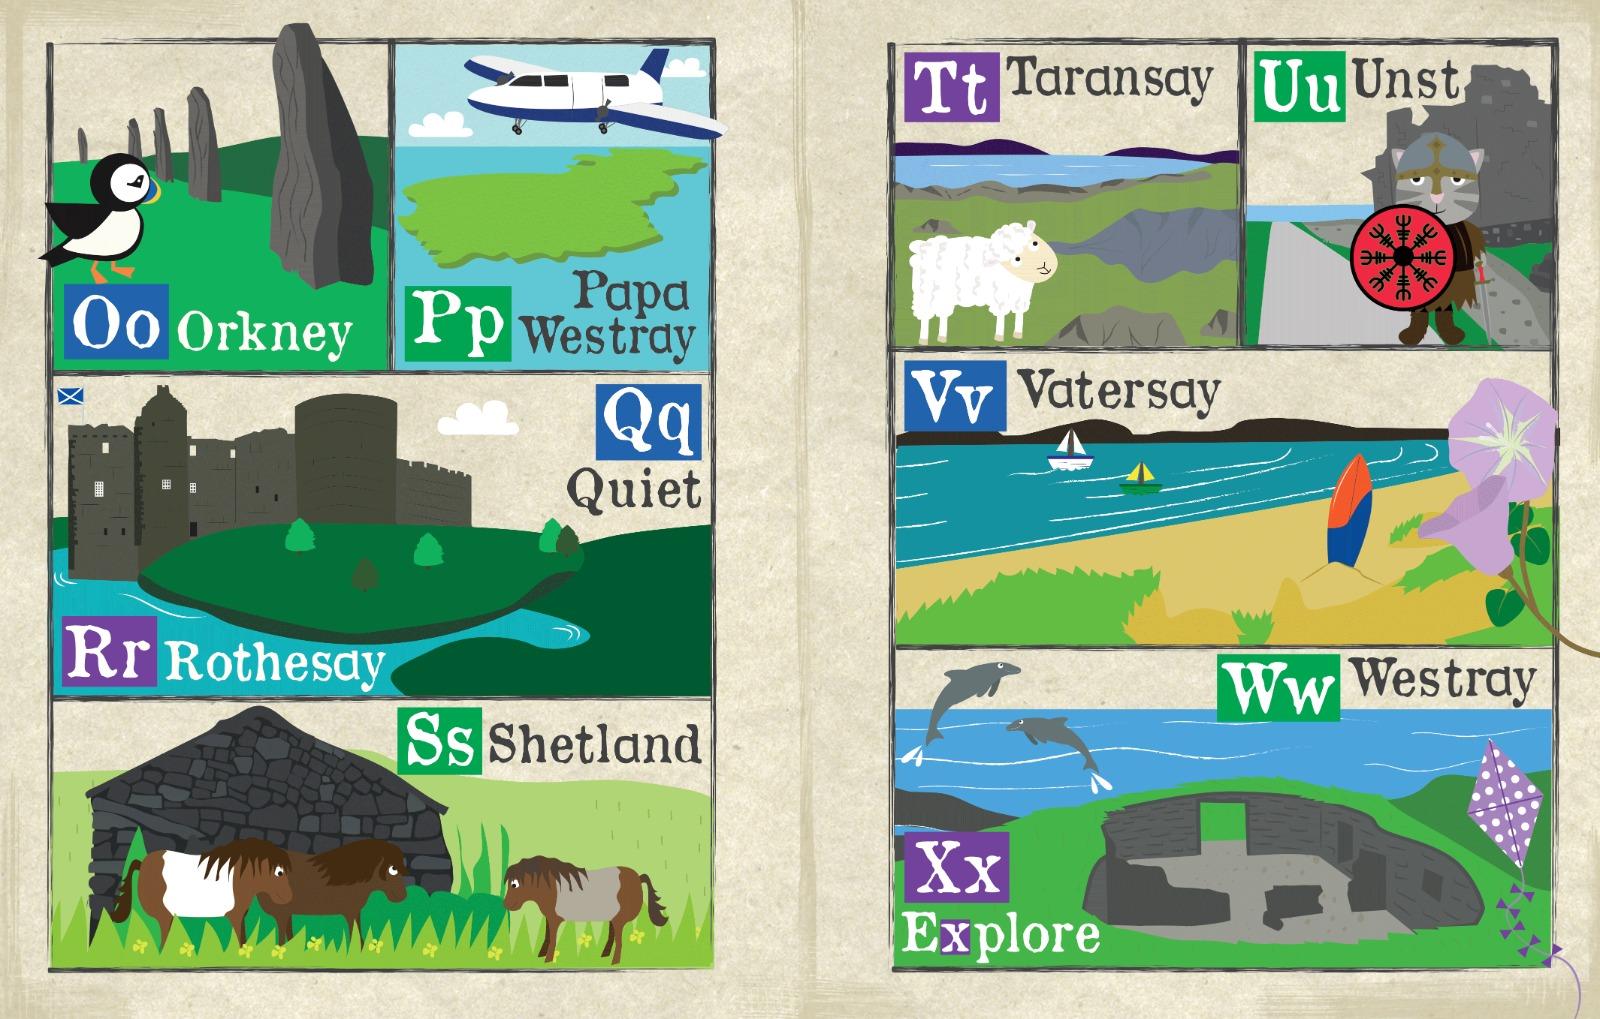 Nursery Times Crinkly Newspaper - A-Z of Scottish Islands